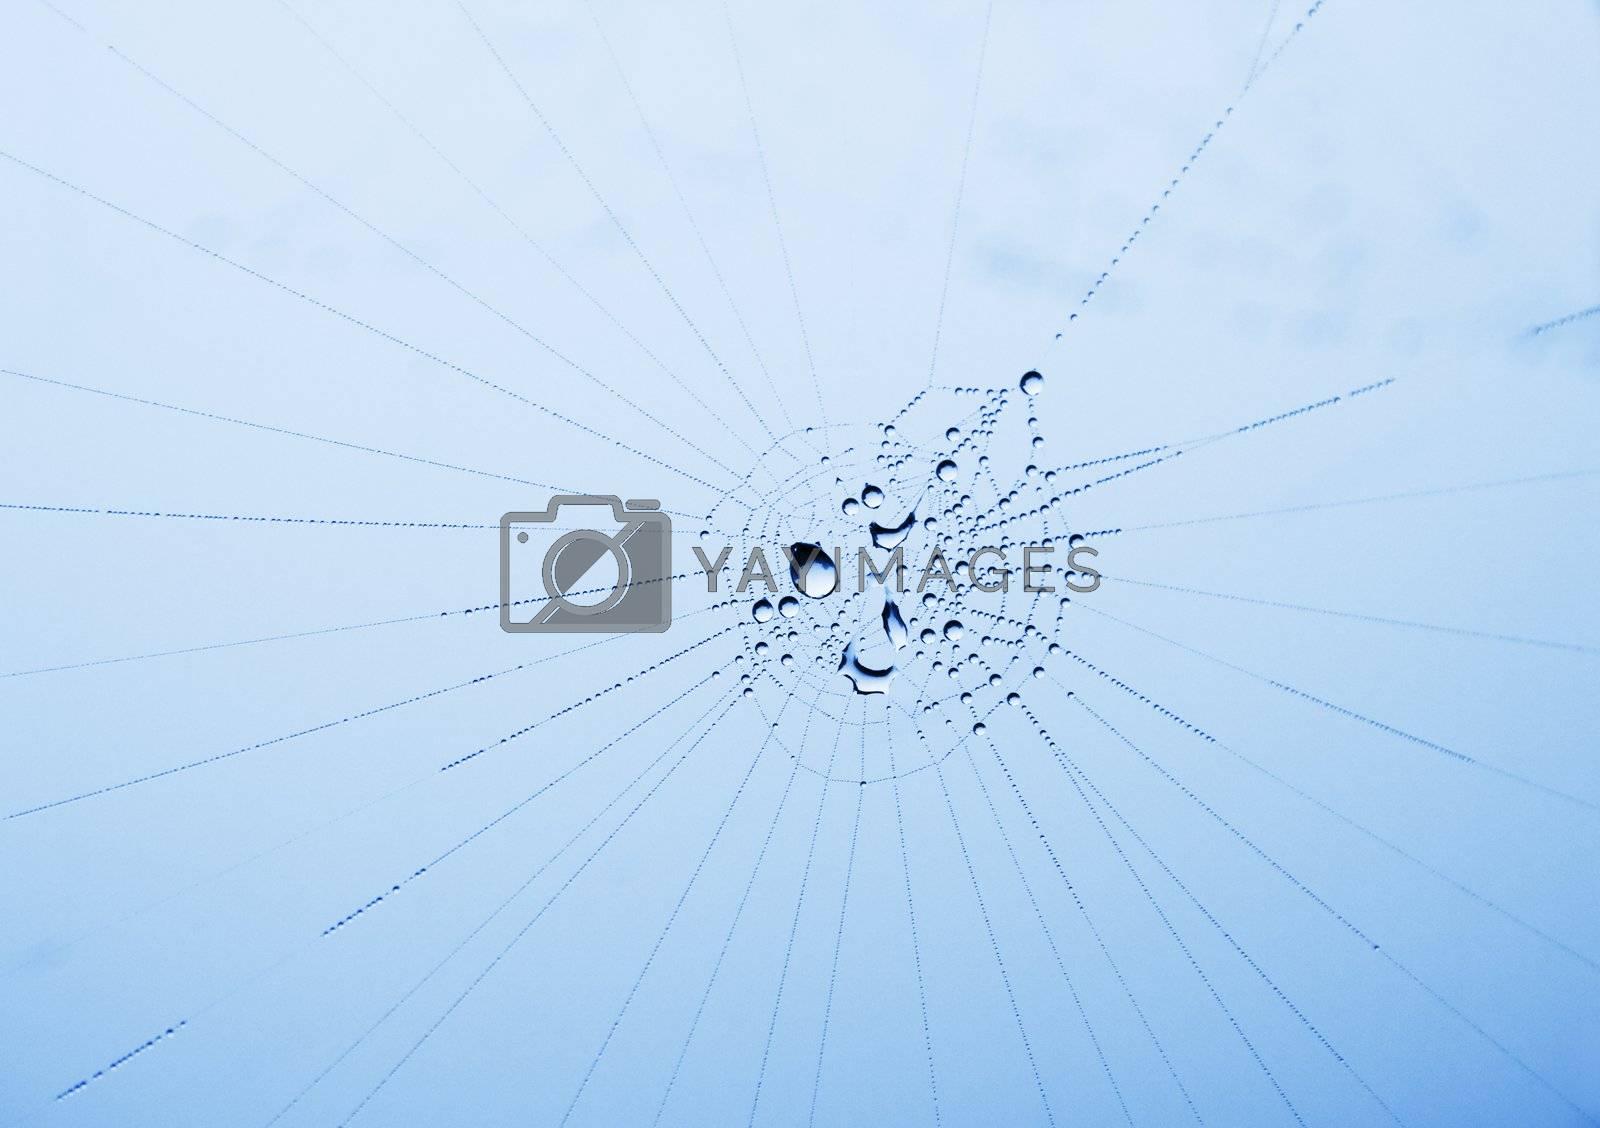 shiny dewdrops on a cobweb against an overcast sky; shallow DOF